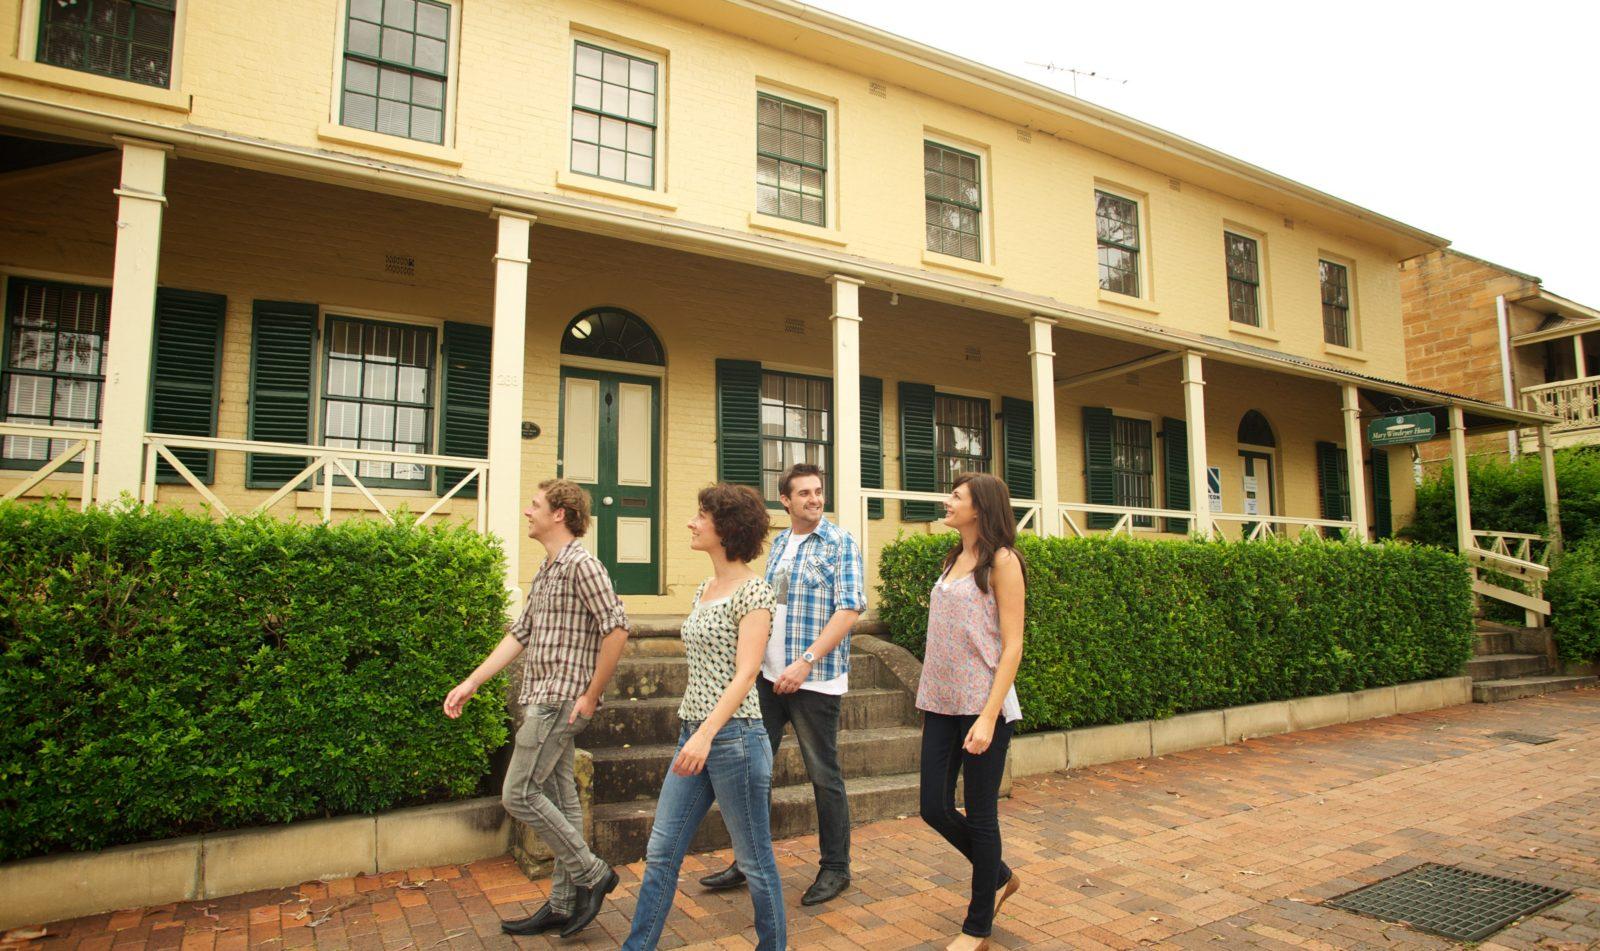 Campbelltown Heritage Precinct